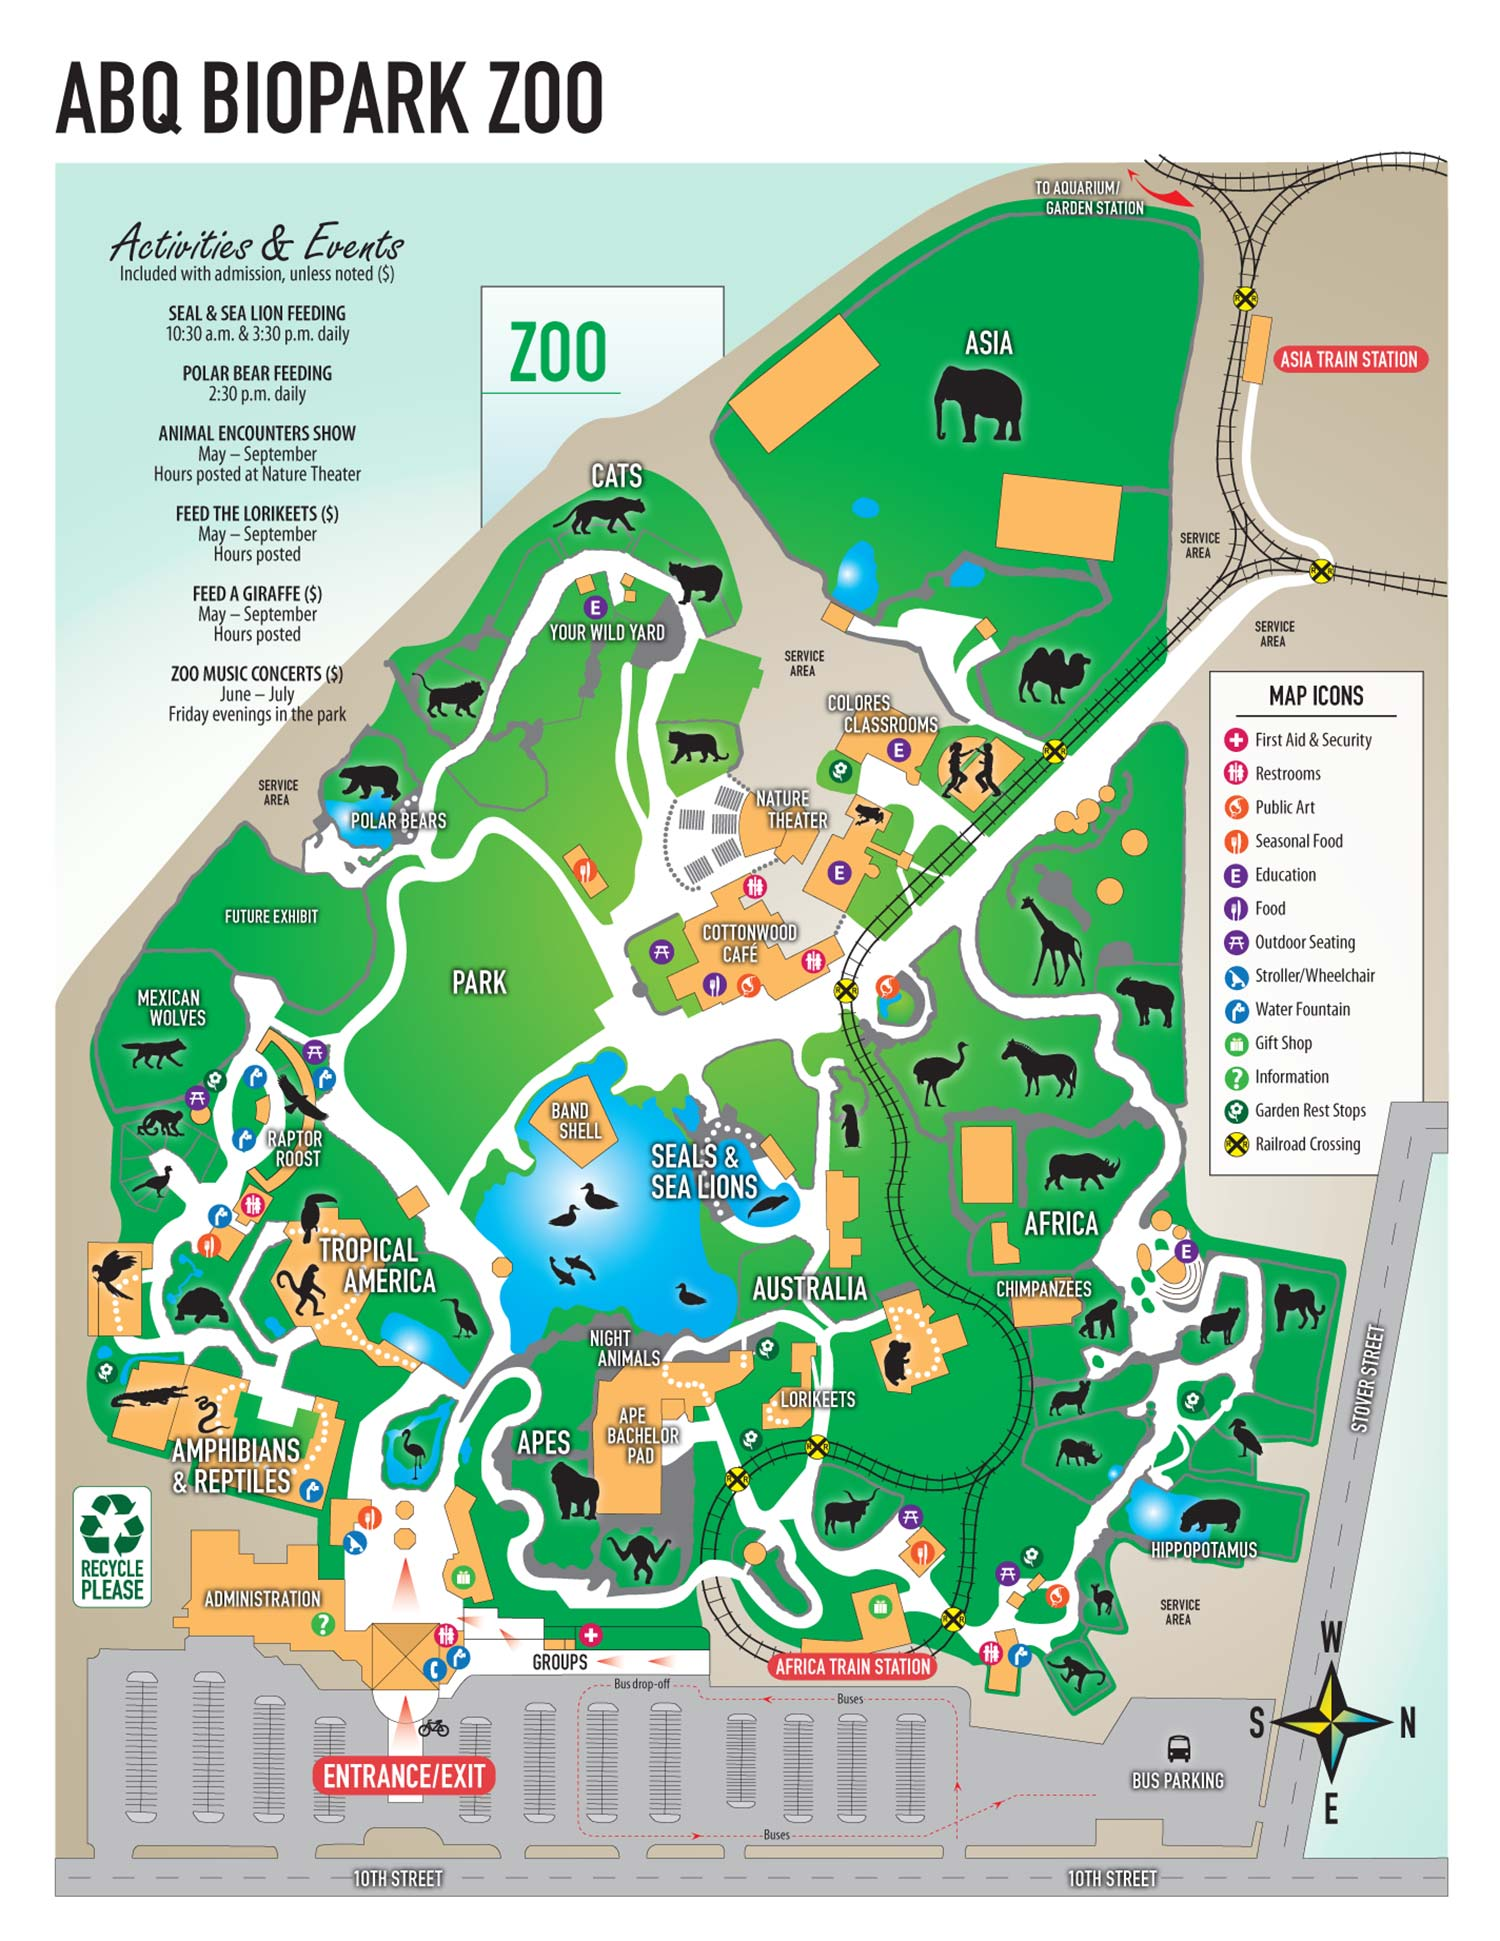 getting here - Abq Biopark Botanic Garden